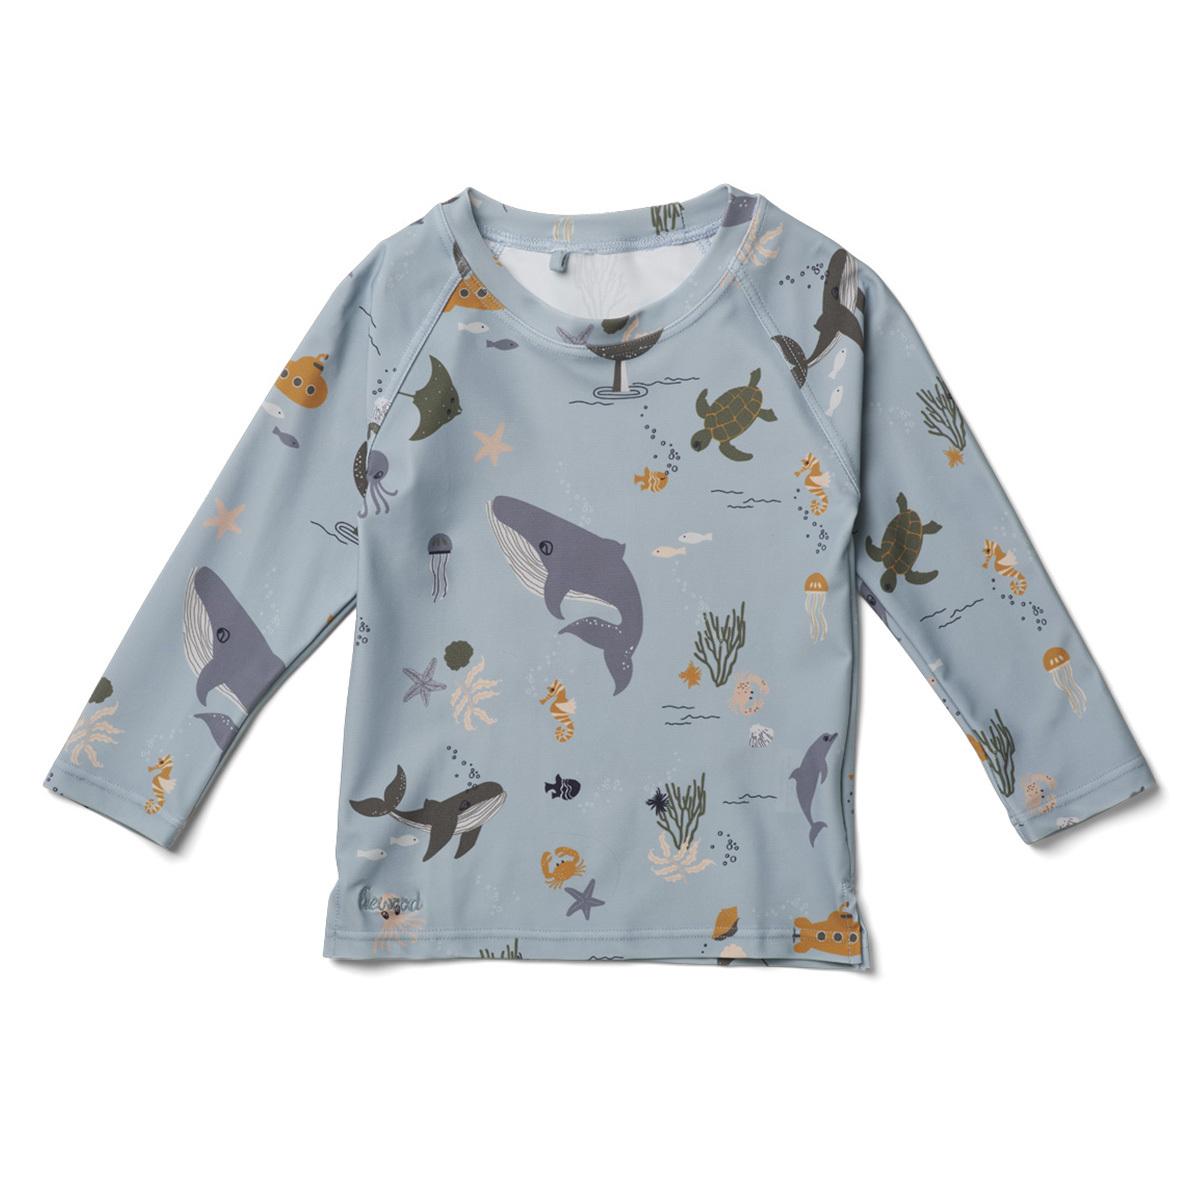 Accessoires bébé Tee-Shirt Noah Sea Creature Mix - 3/9 Mois Tee-Shirt Noah Sea Creature Mix - 3/9 Mois